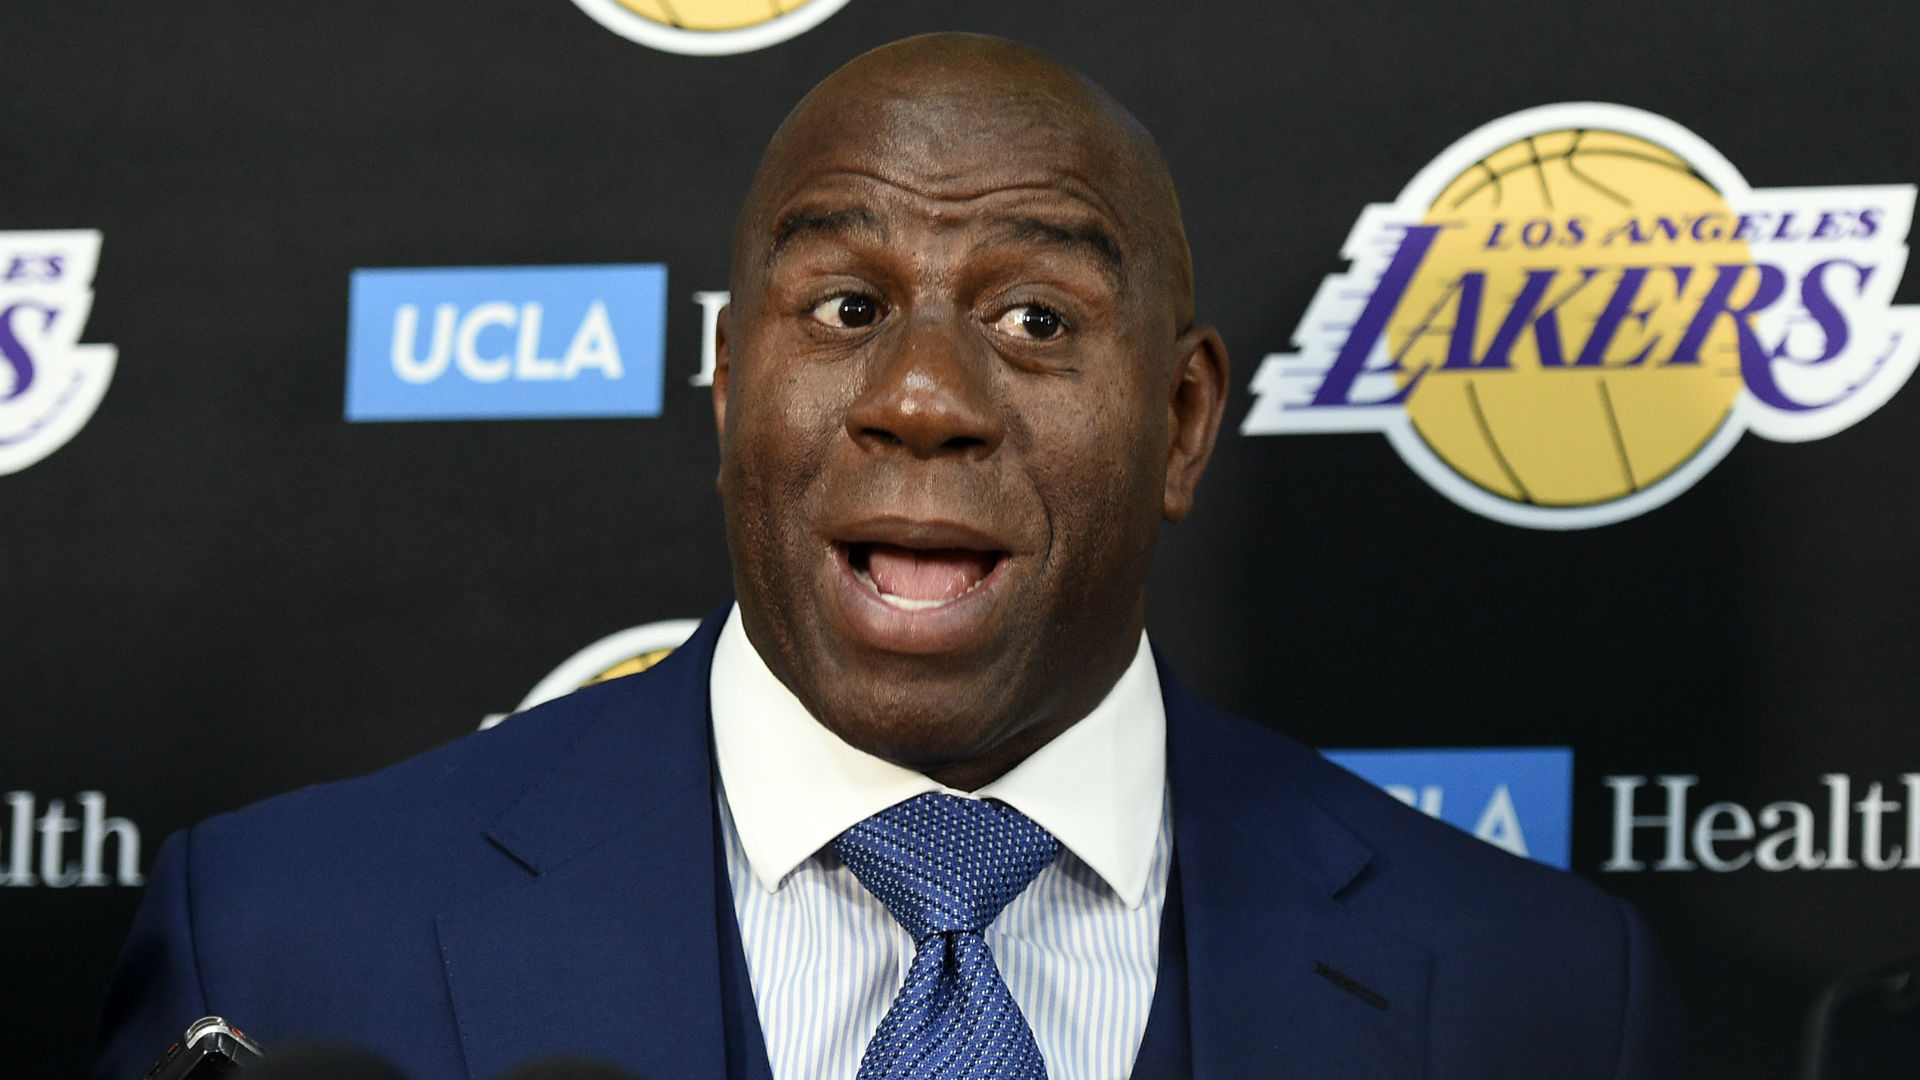 Magic Johnson congratulates Lakers